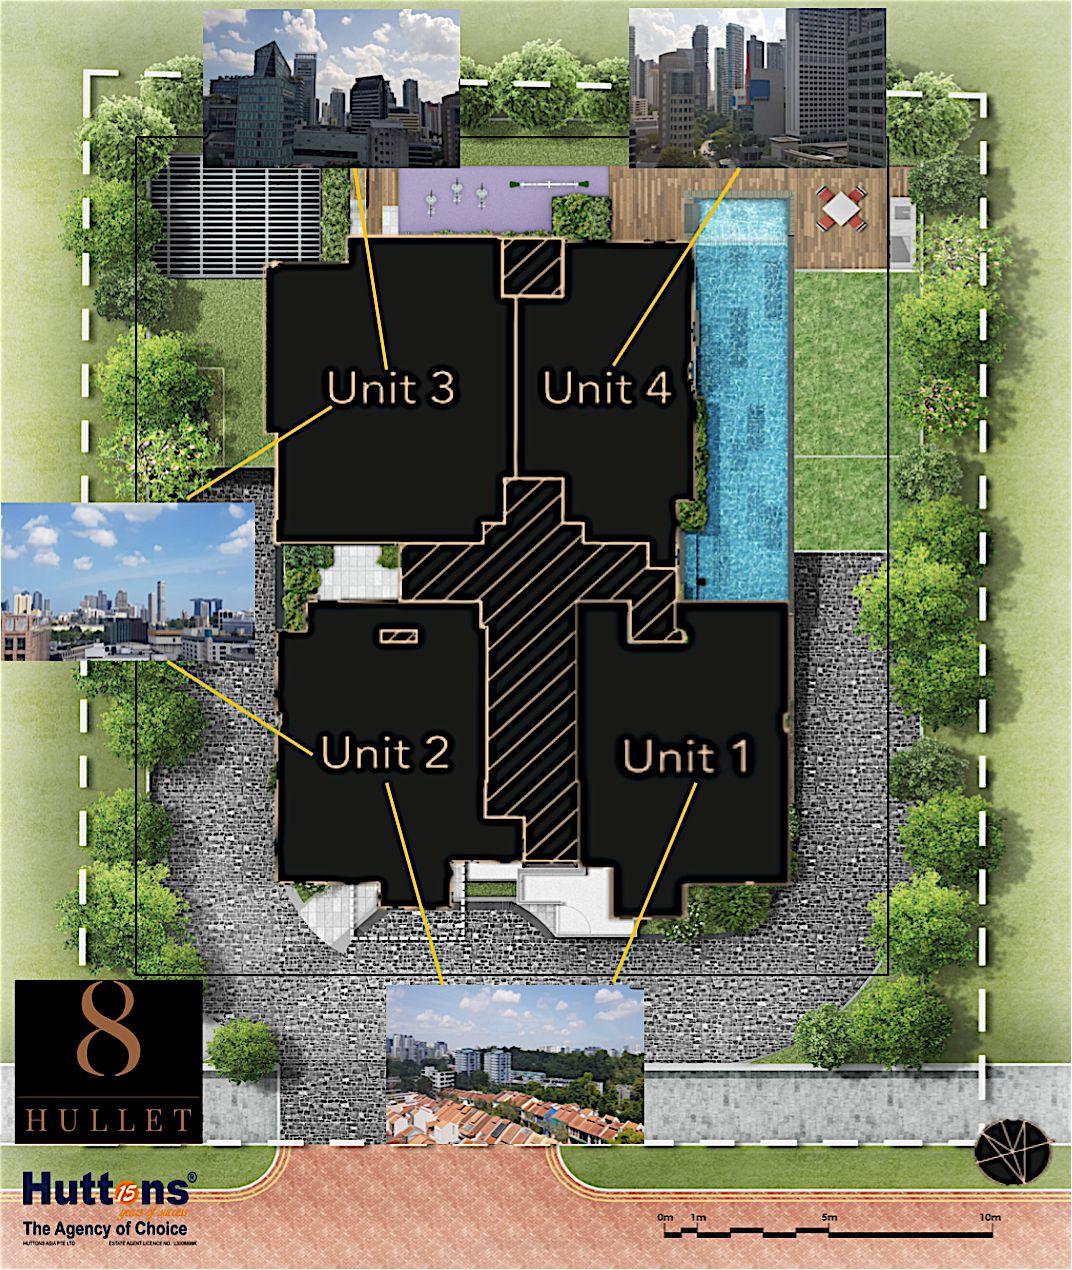 newlaunch.sg 8 hullet sitemap